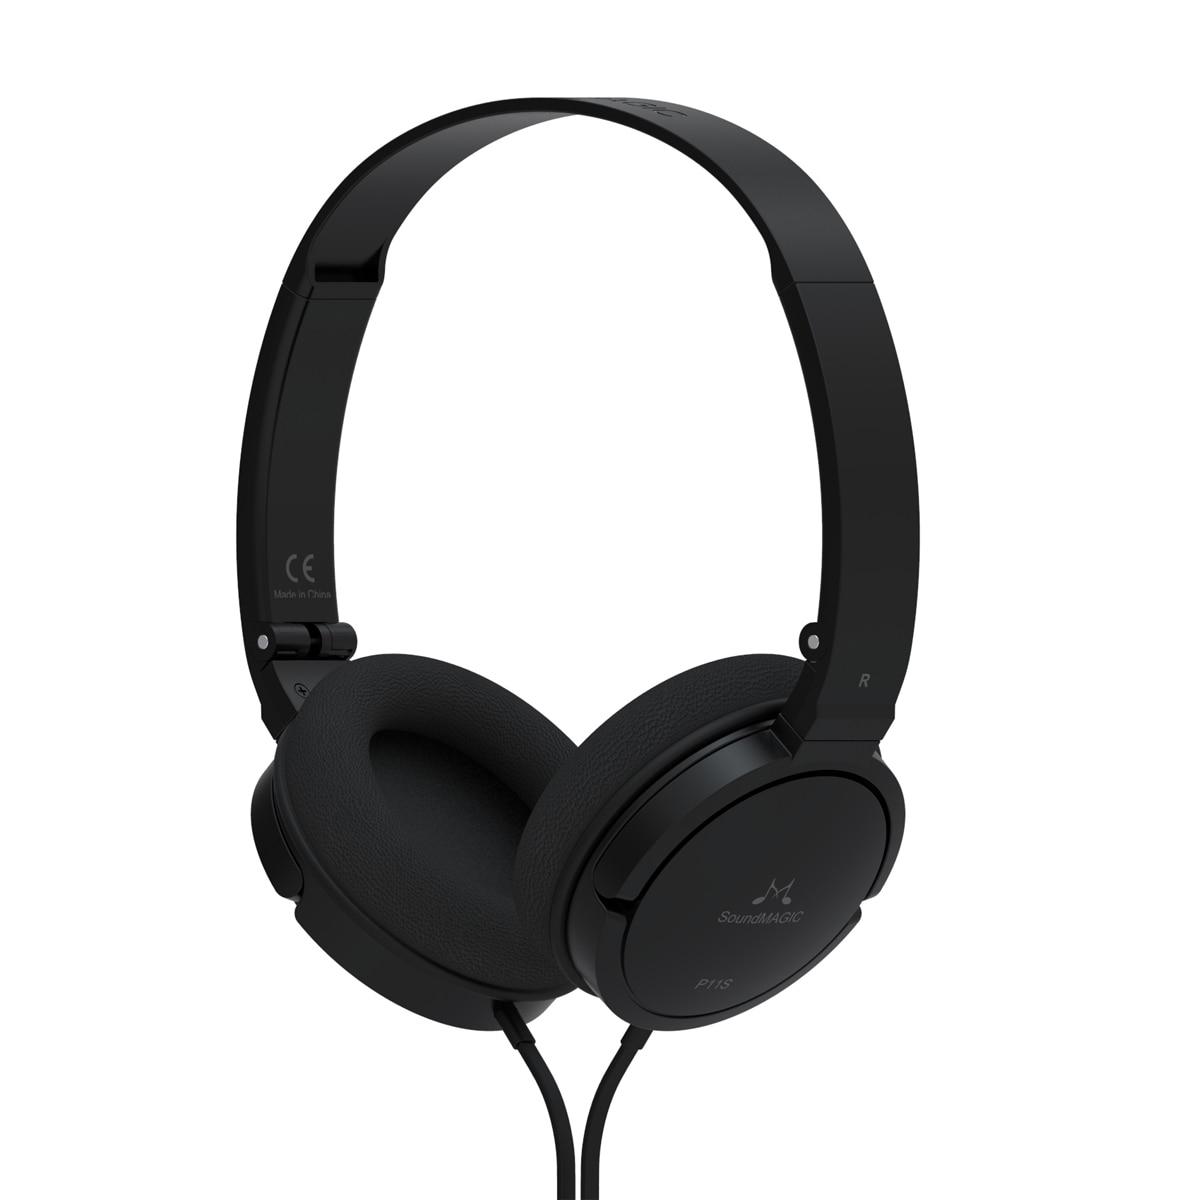 New Hot Soundmagic p11s headset earphones belt Hifi ear remote control Headphones For Portable Media Player Mobile Phone portable media player